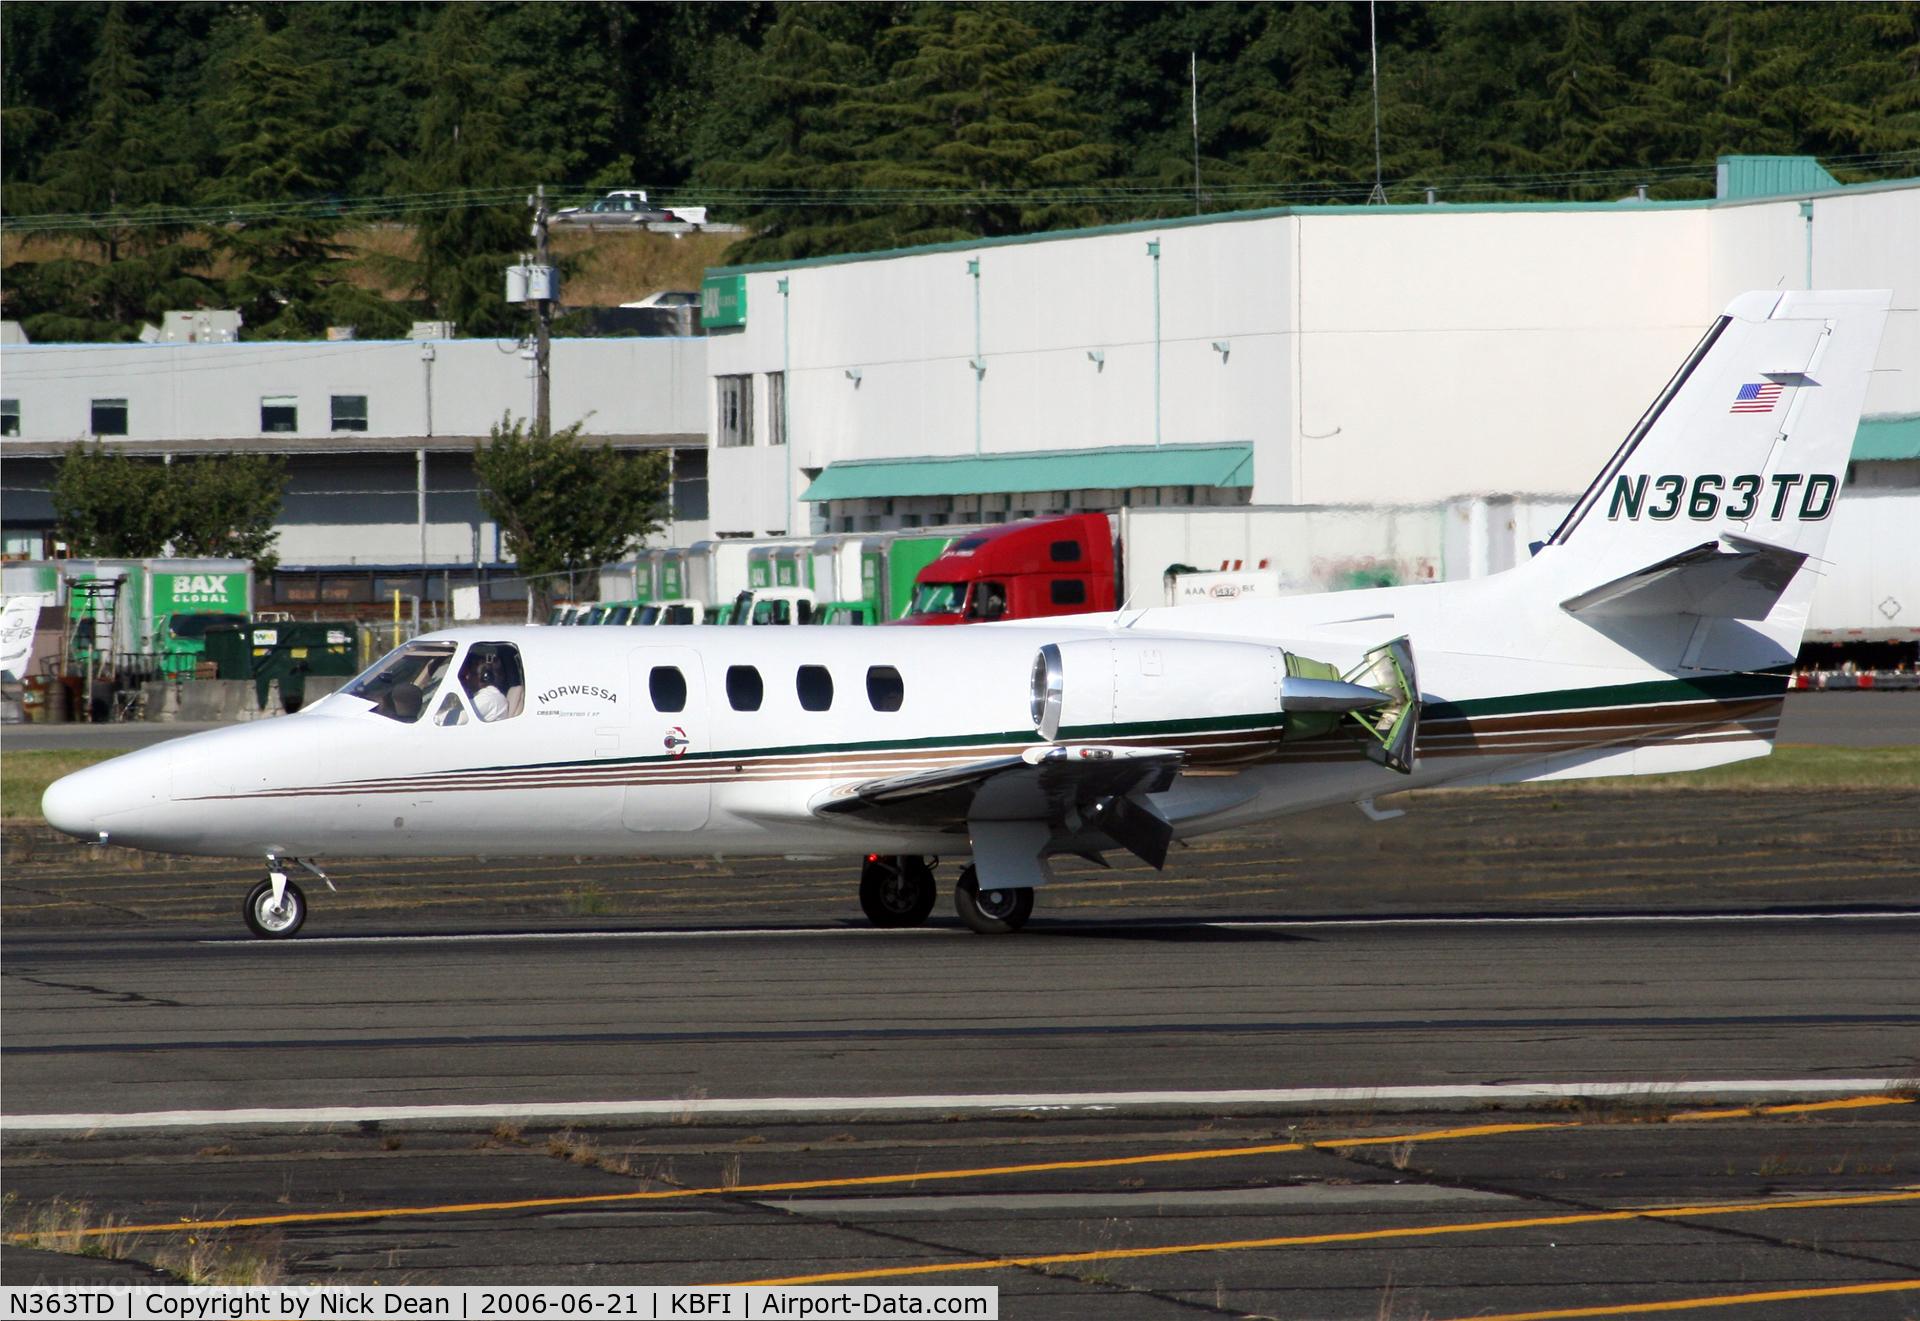 N363TD, 1978 Cessna 501 Citation I/SP C/N 501-0068, KBFI